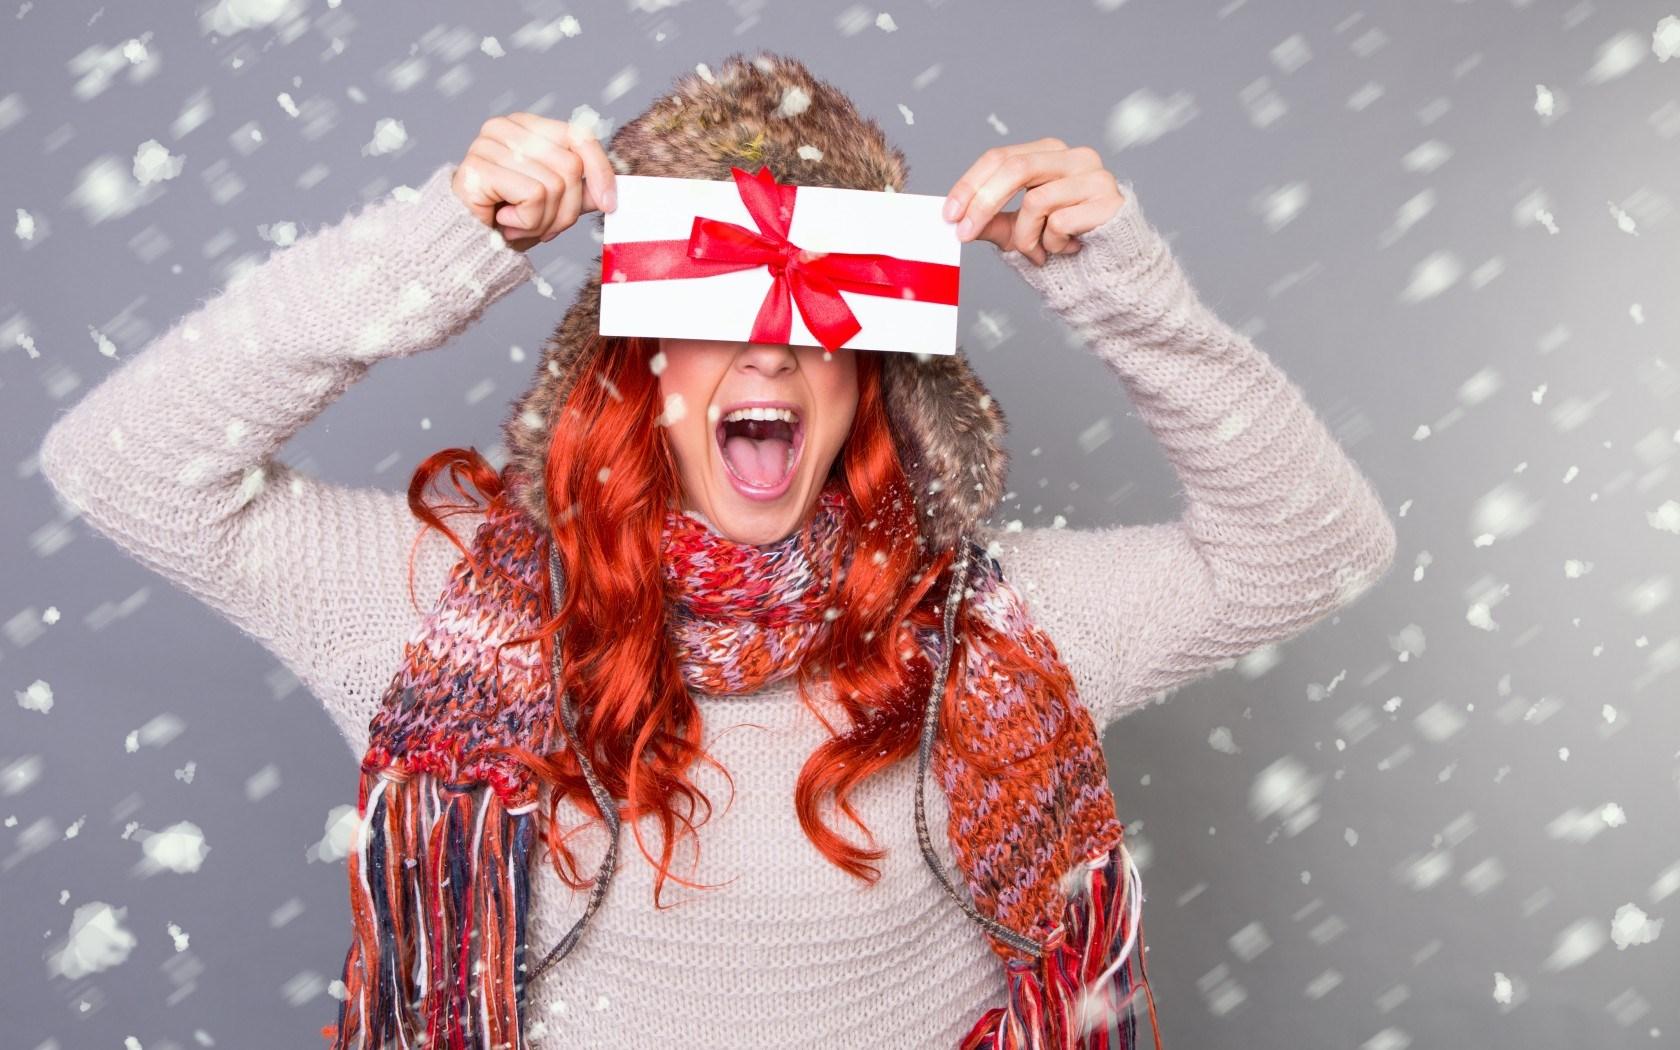 Envelope Girl Redhead Christmas Holiday New Year